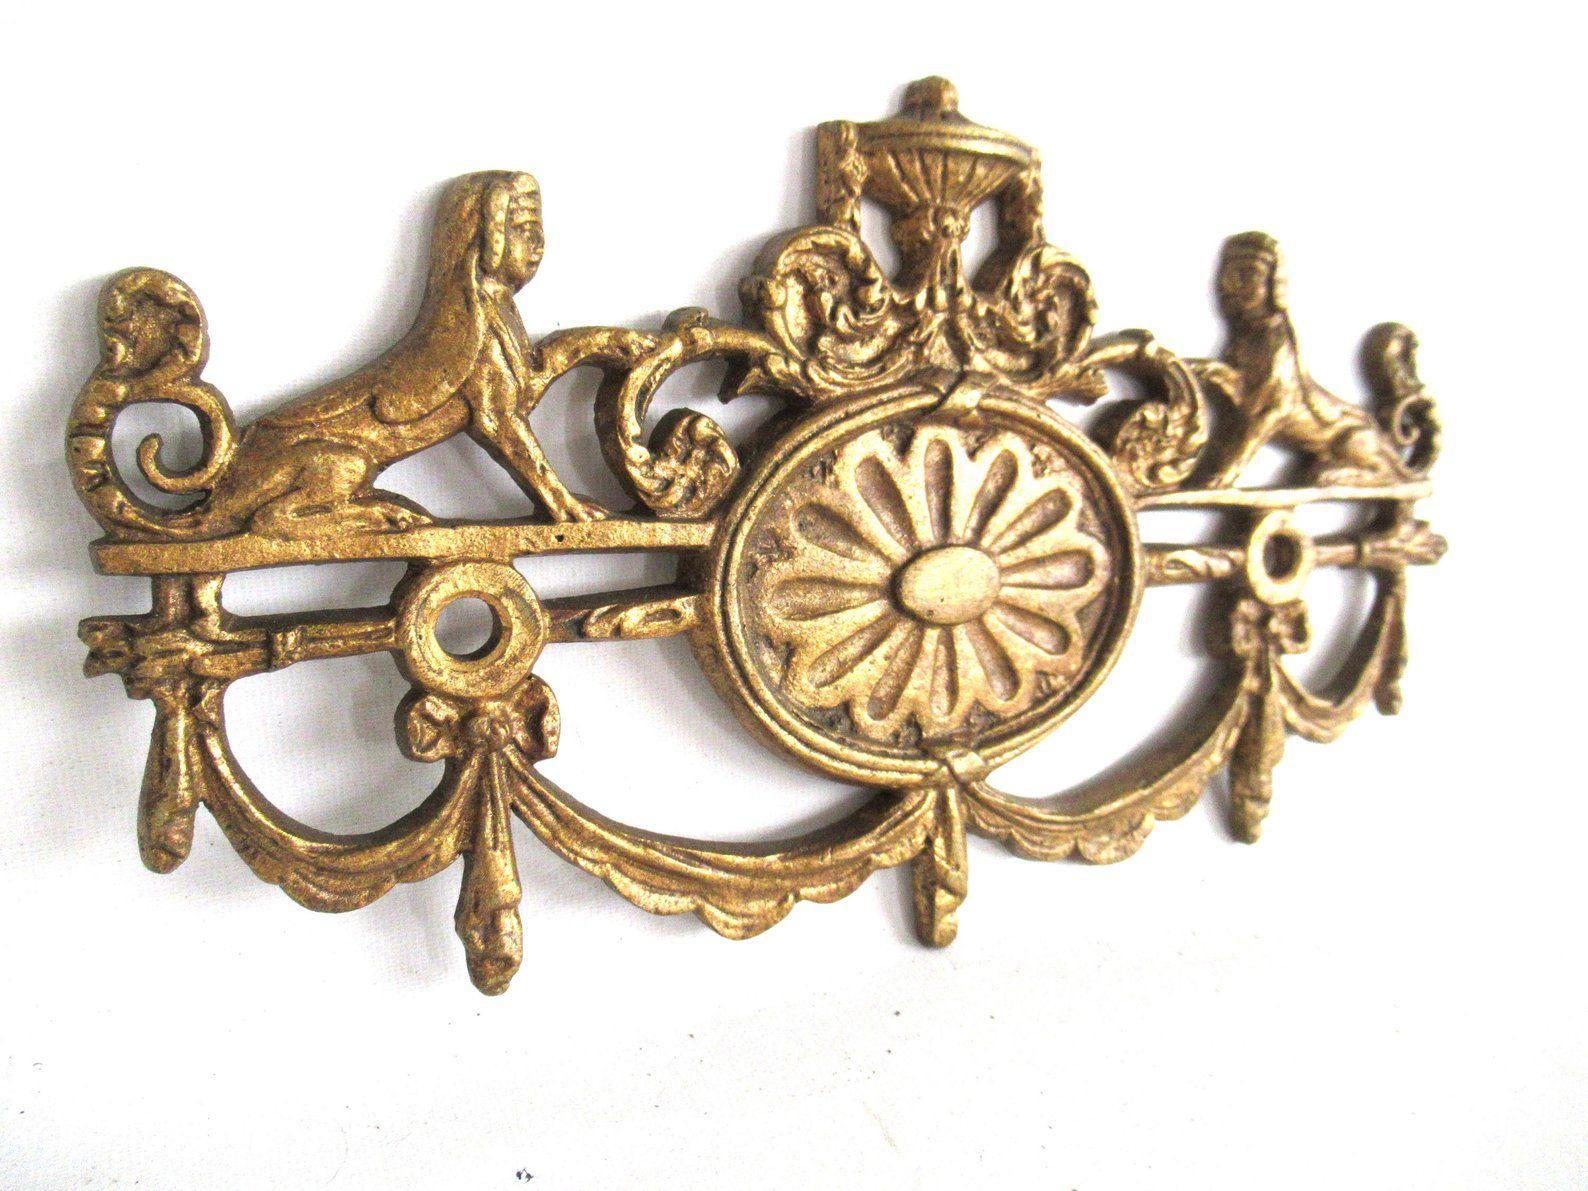 Antique Brass Ormolu Hardware Mount Gilt Leaf Rococo Victorian Old